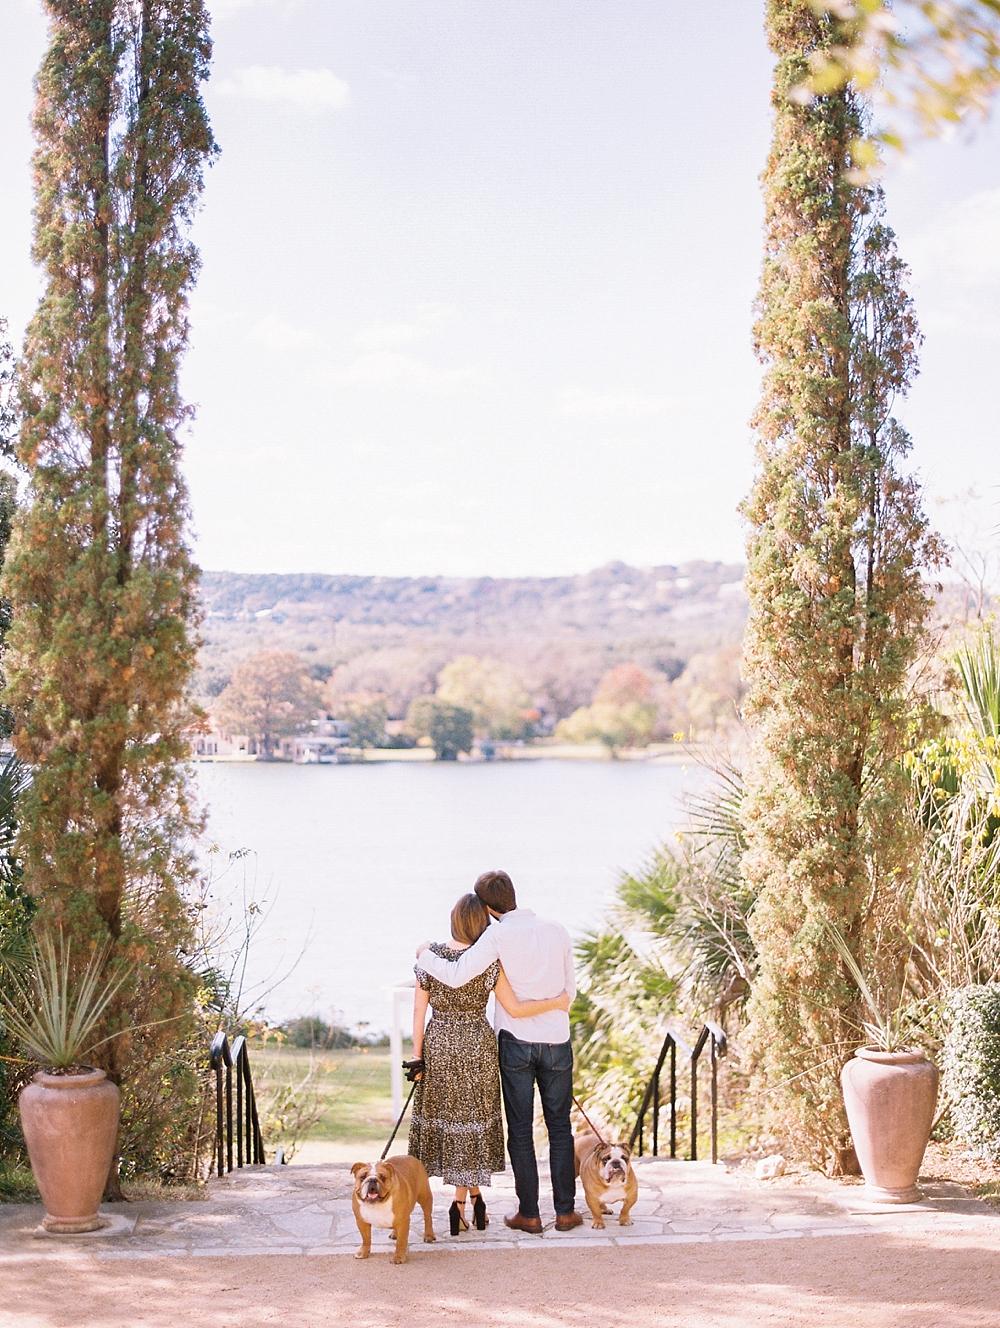 kristin-la-voie-photography-Austin-Wedding-Photographer-laguna-gloria-commodore-perry-estate-engagement-99